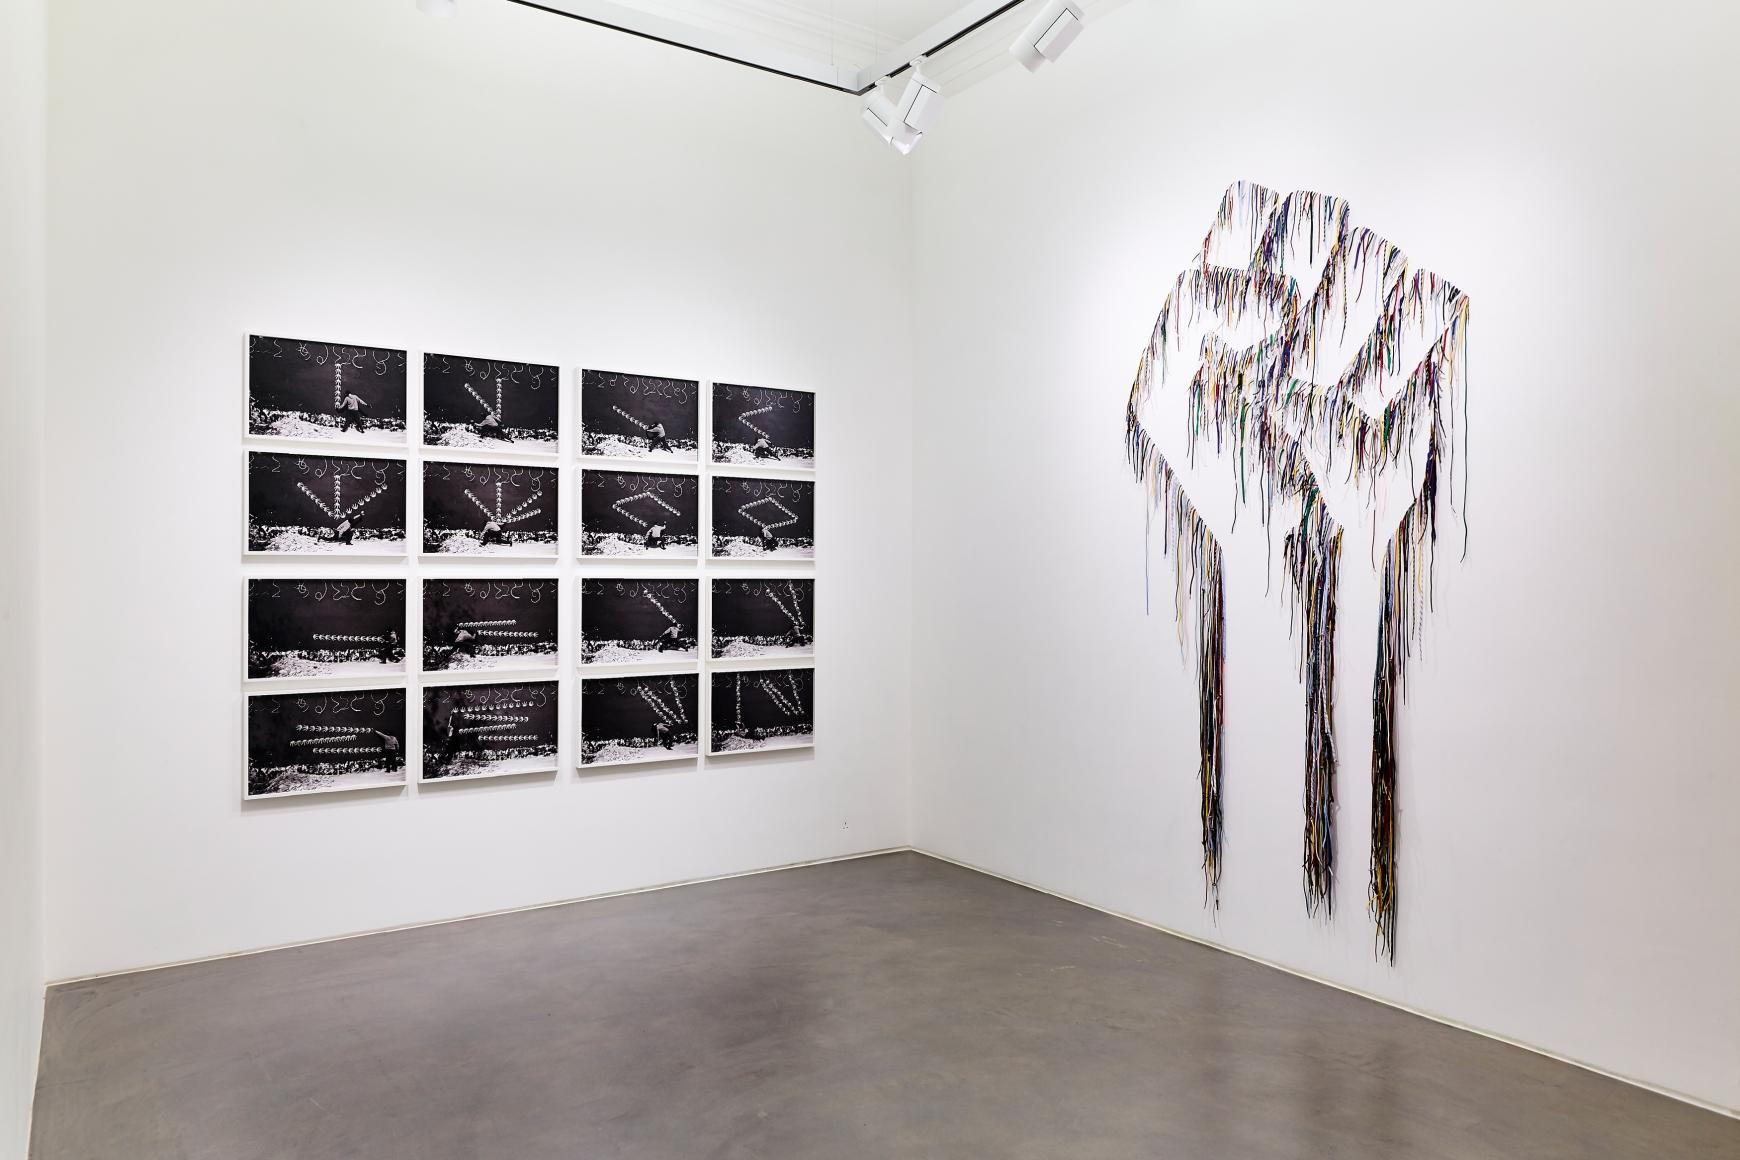 Exhibition view 1 of Robin Rhode & Nari Ward: Power Wall